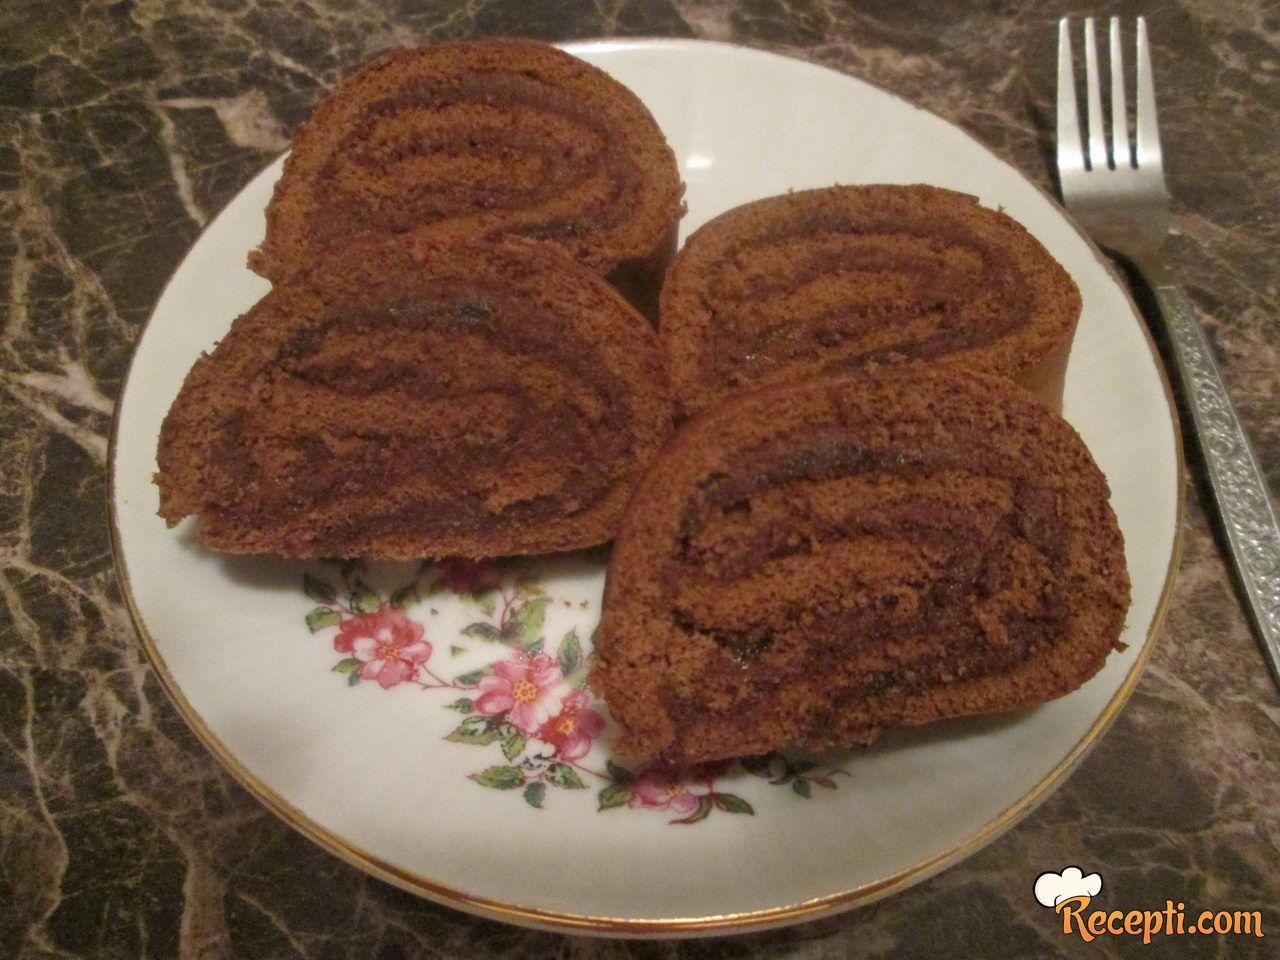 Čokoladni rolat (7)